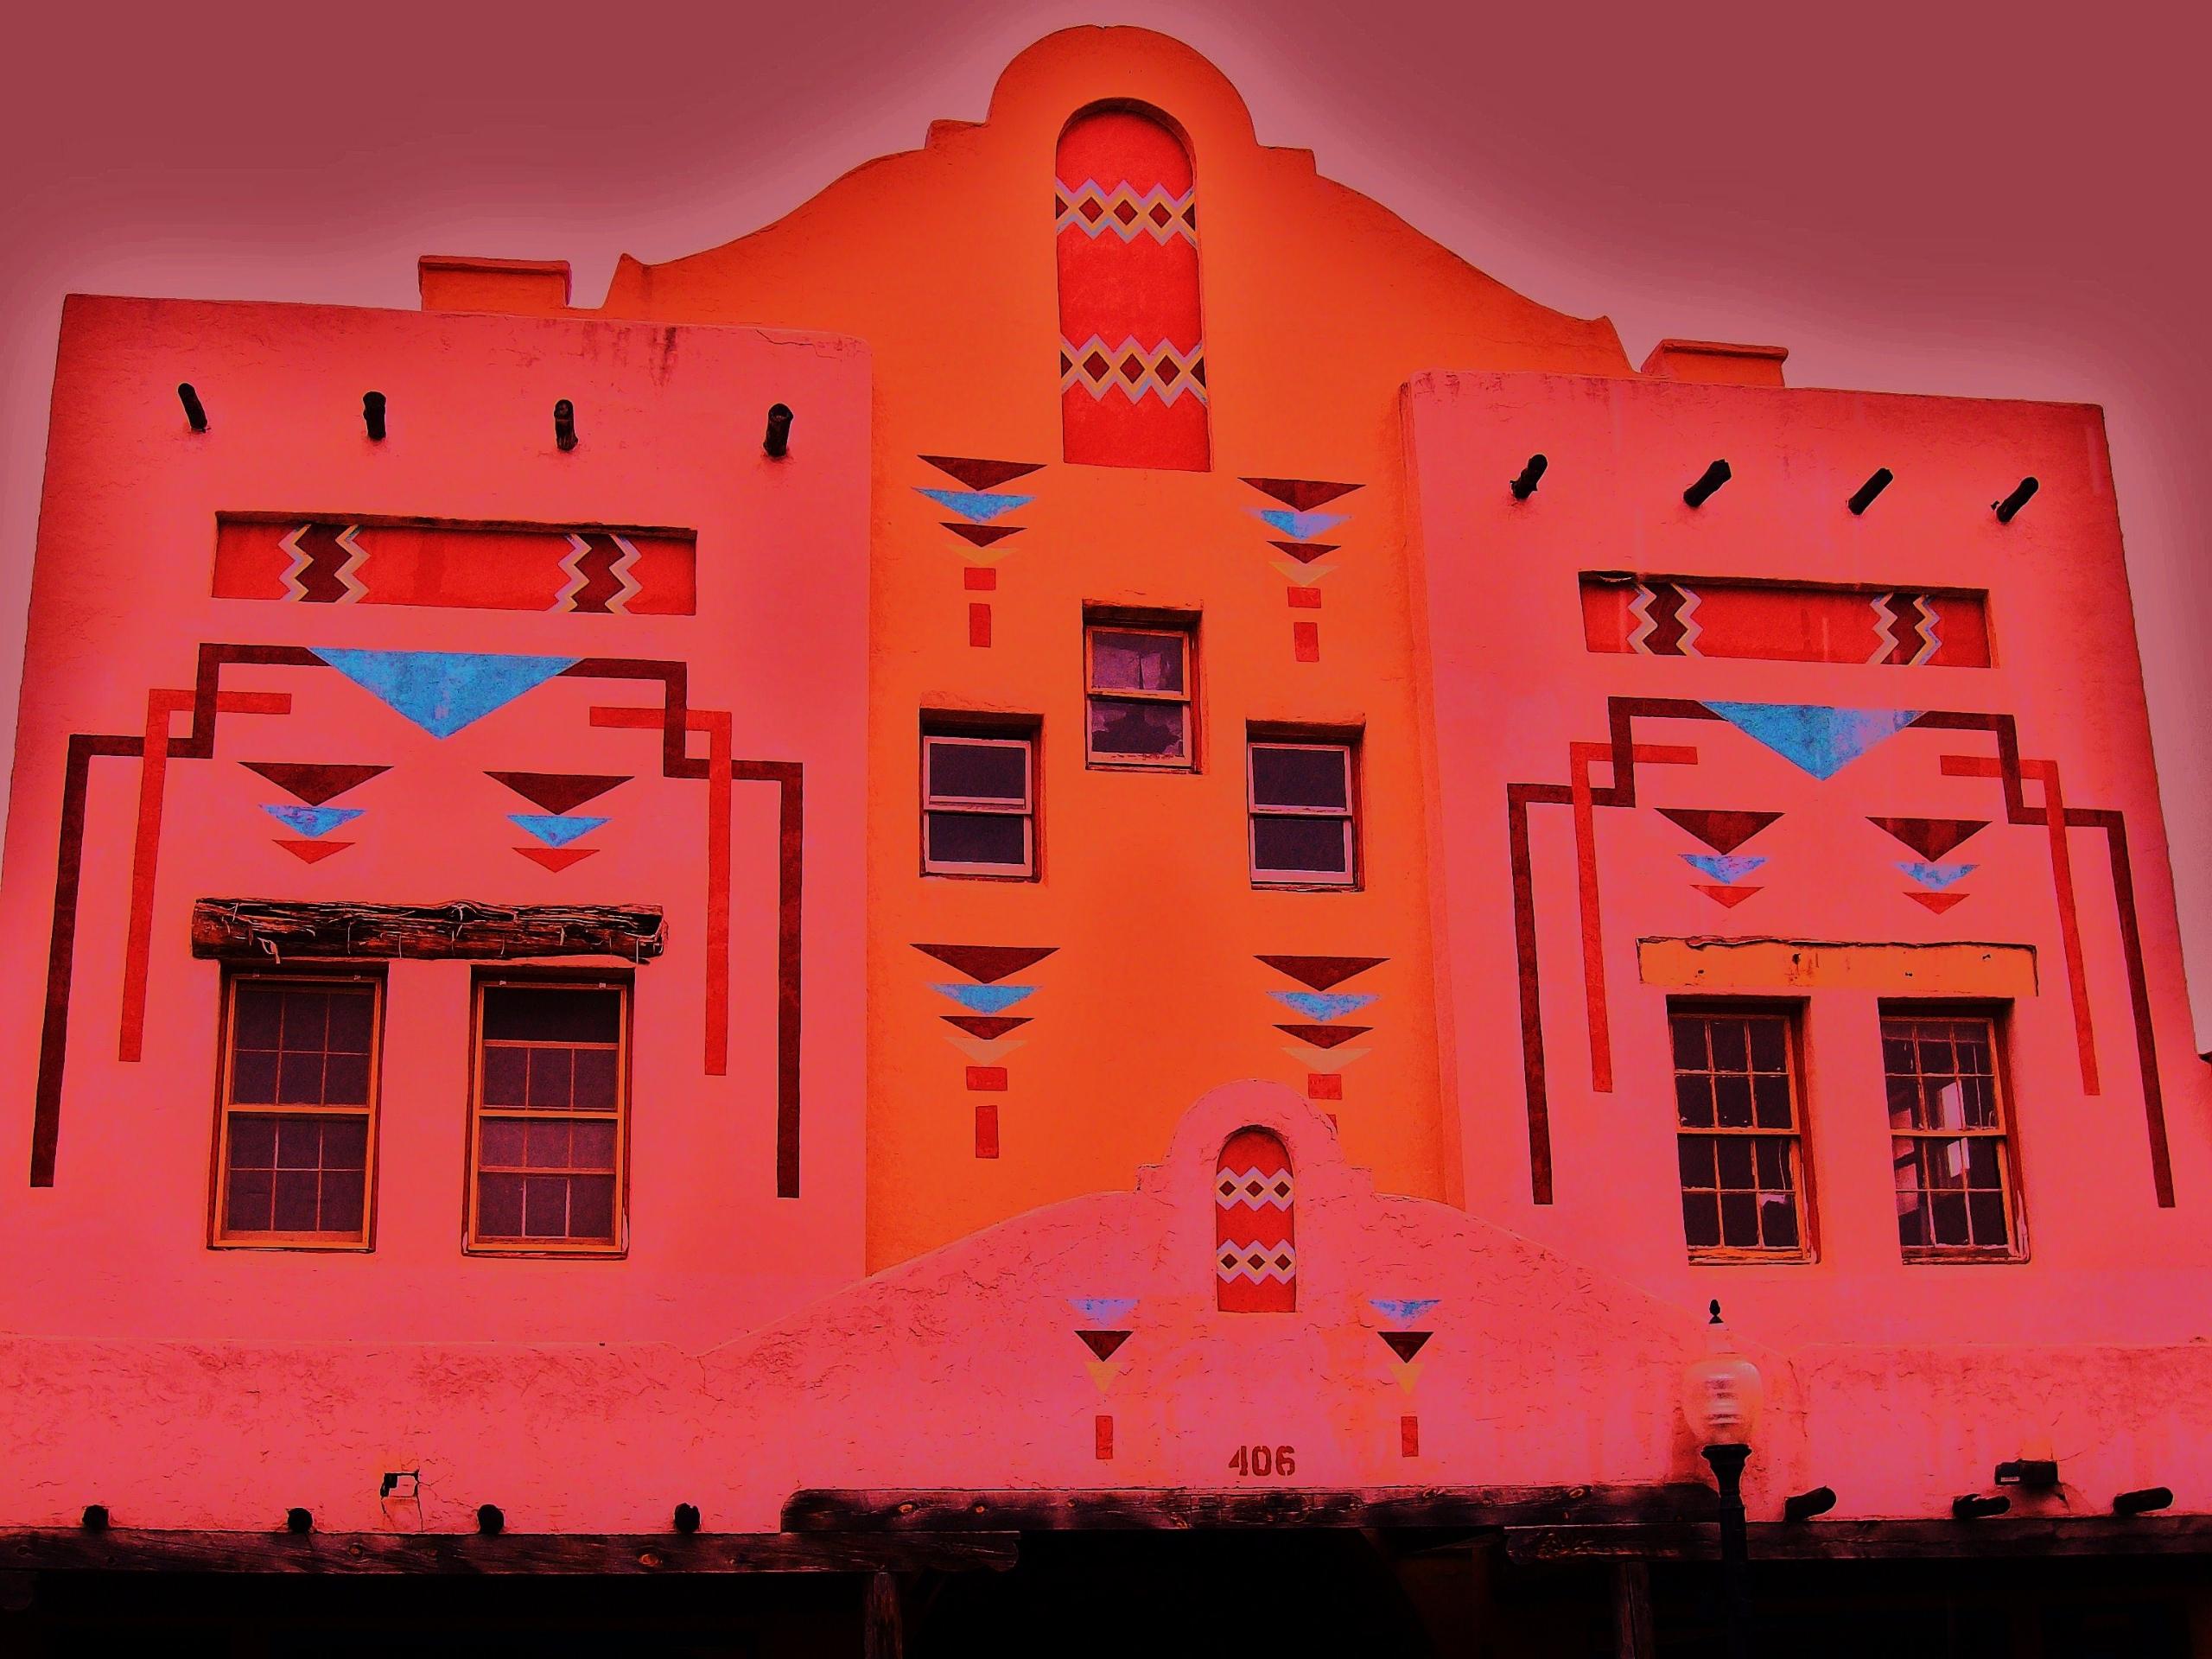 Facade building - architecture, NewMexico - sirhowardlee | ello